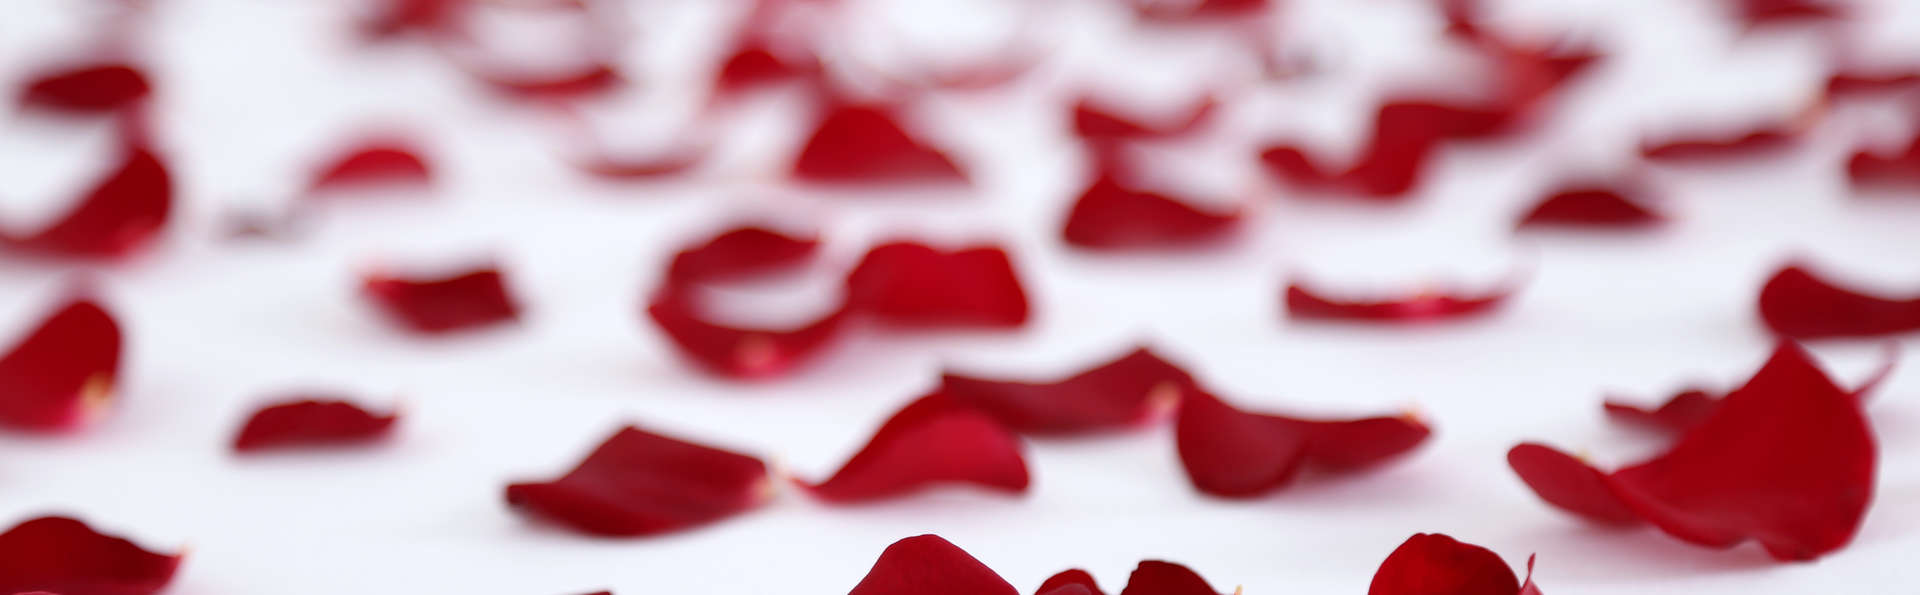 Week-end avec cadeaux romantiques à Vilafranca del Penedès